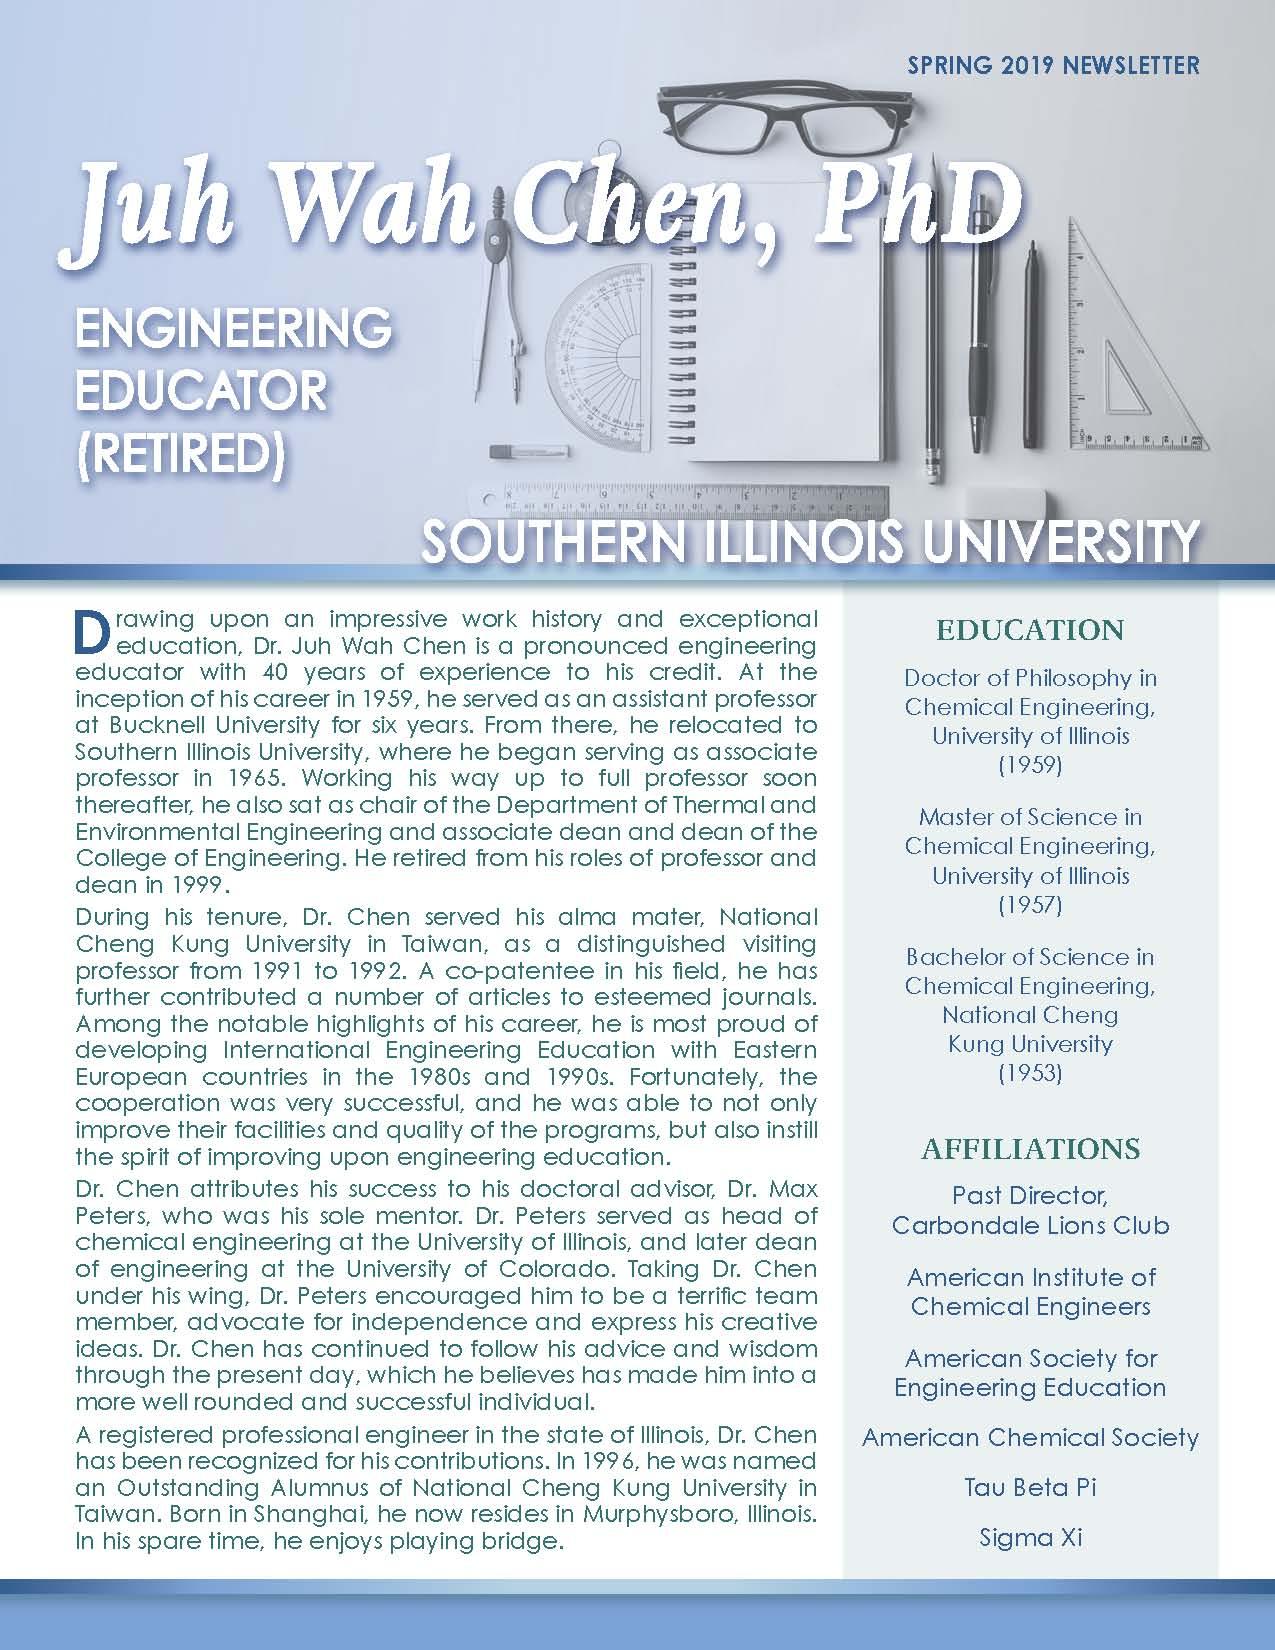 Chen, Juh Wah 4357185_25492778 Newsletter.jpg